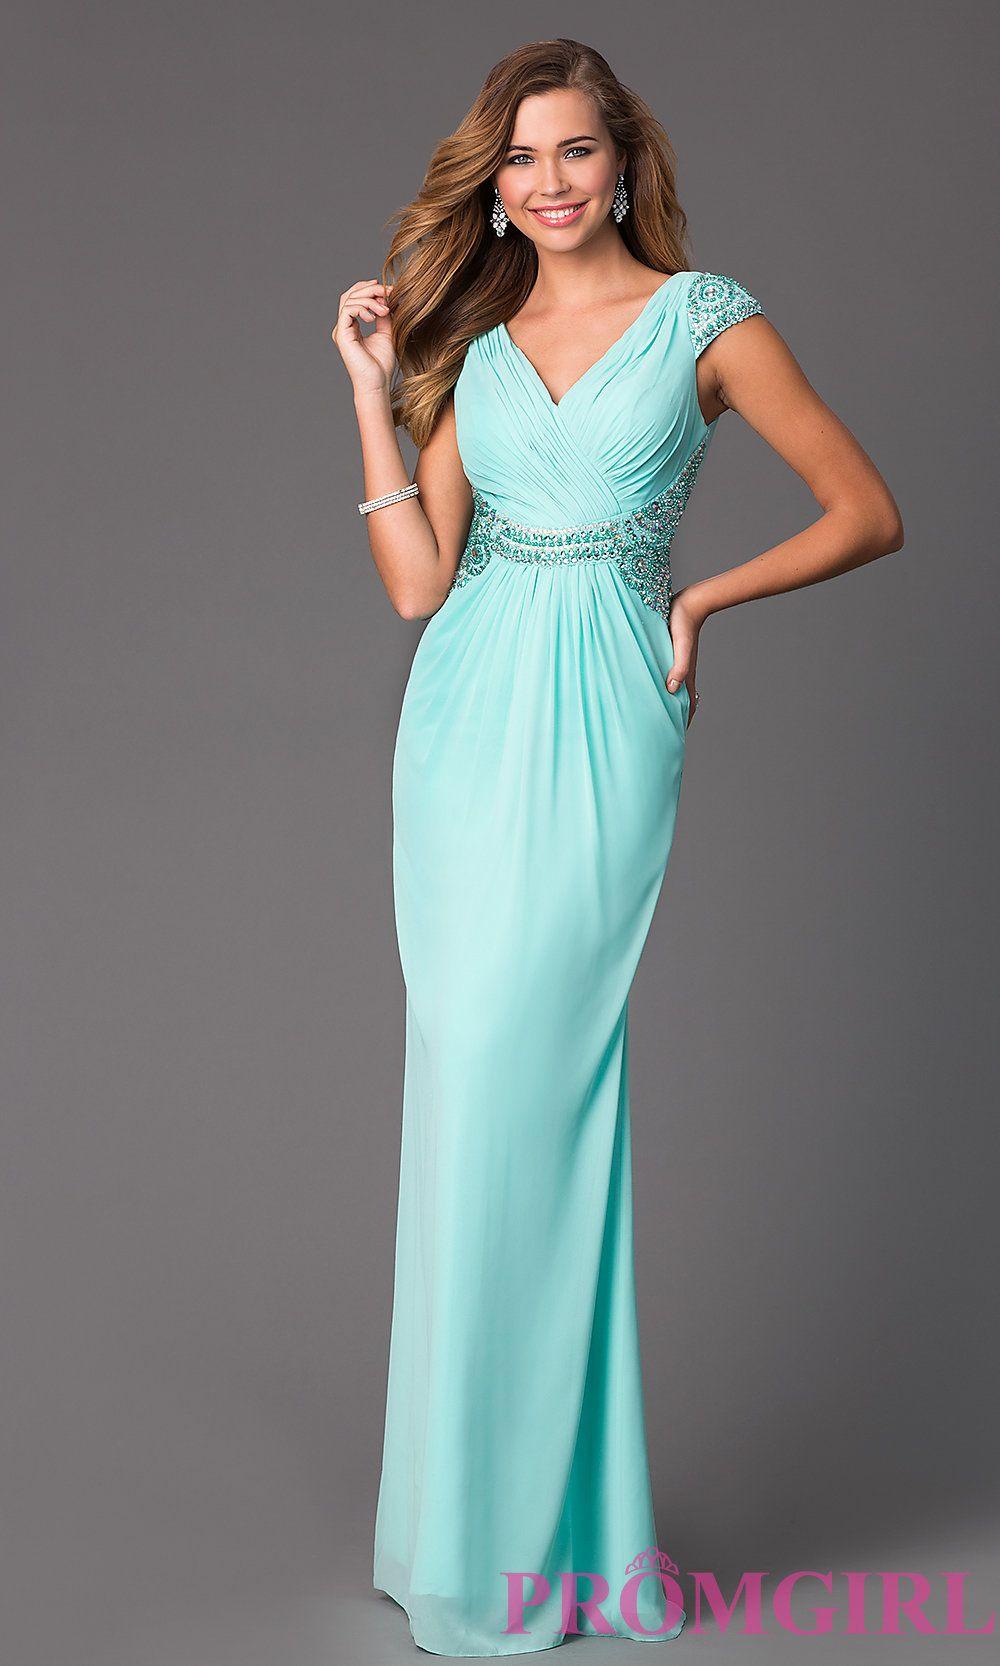 Perfect Prom Dresses Bakersfield Ca Ornament - All Wedding Dresses ...